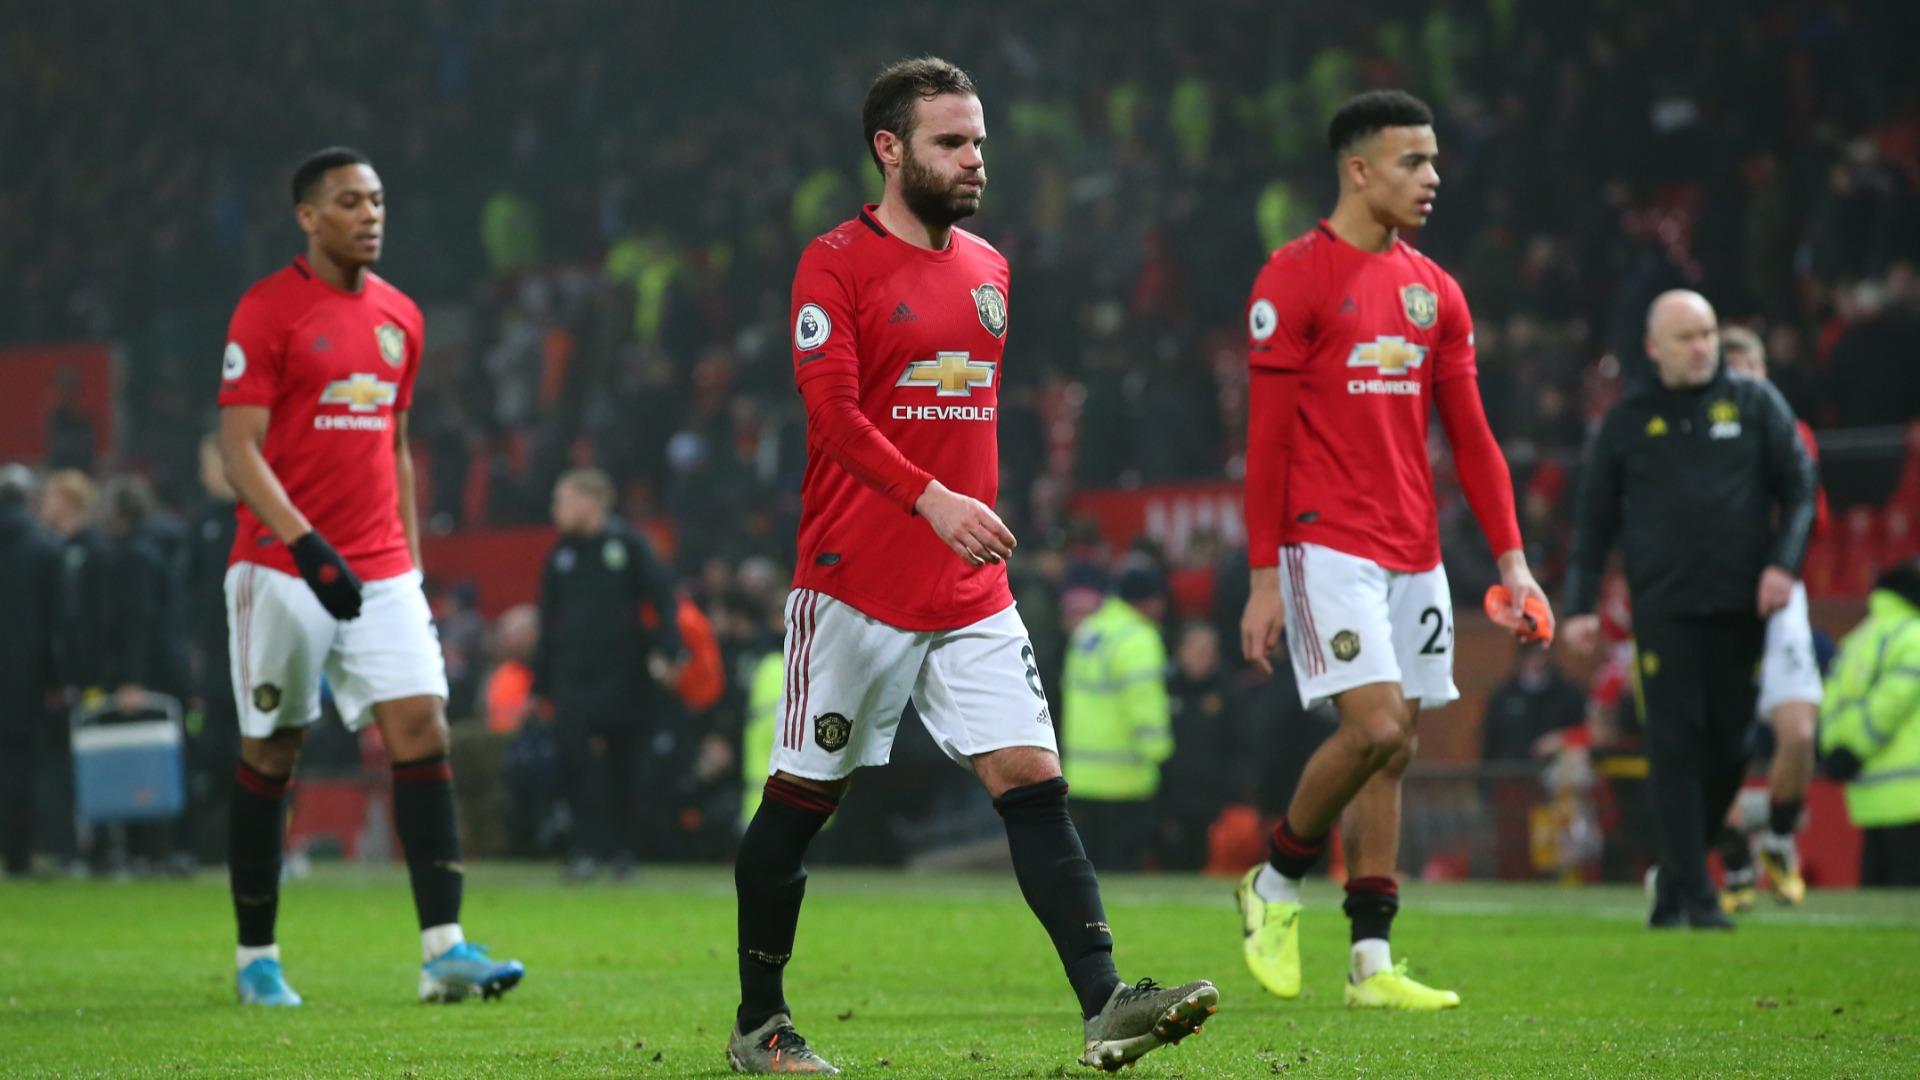 Man Utd 'mentally' need mid-season break - Solskjaer